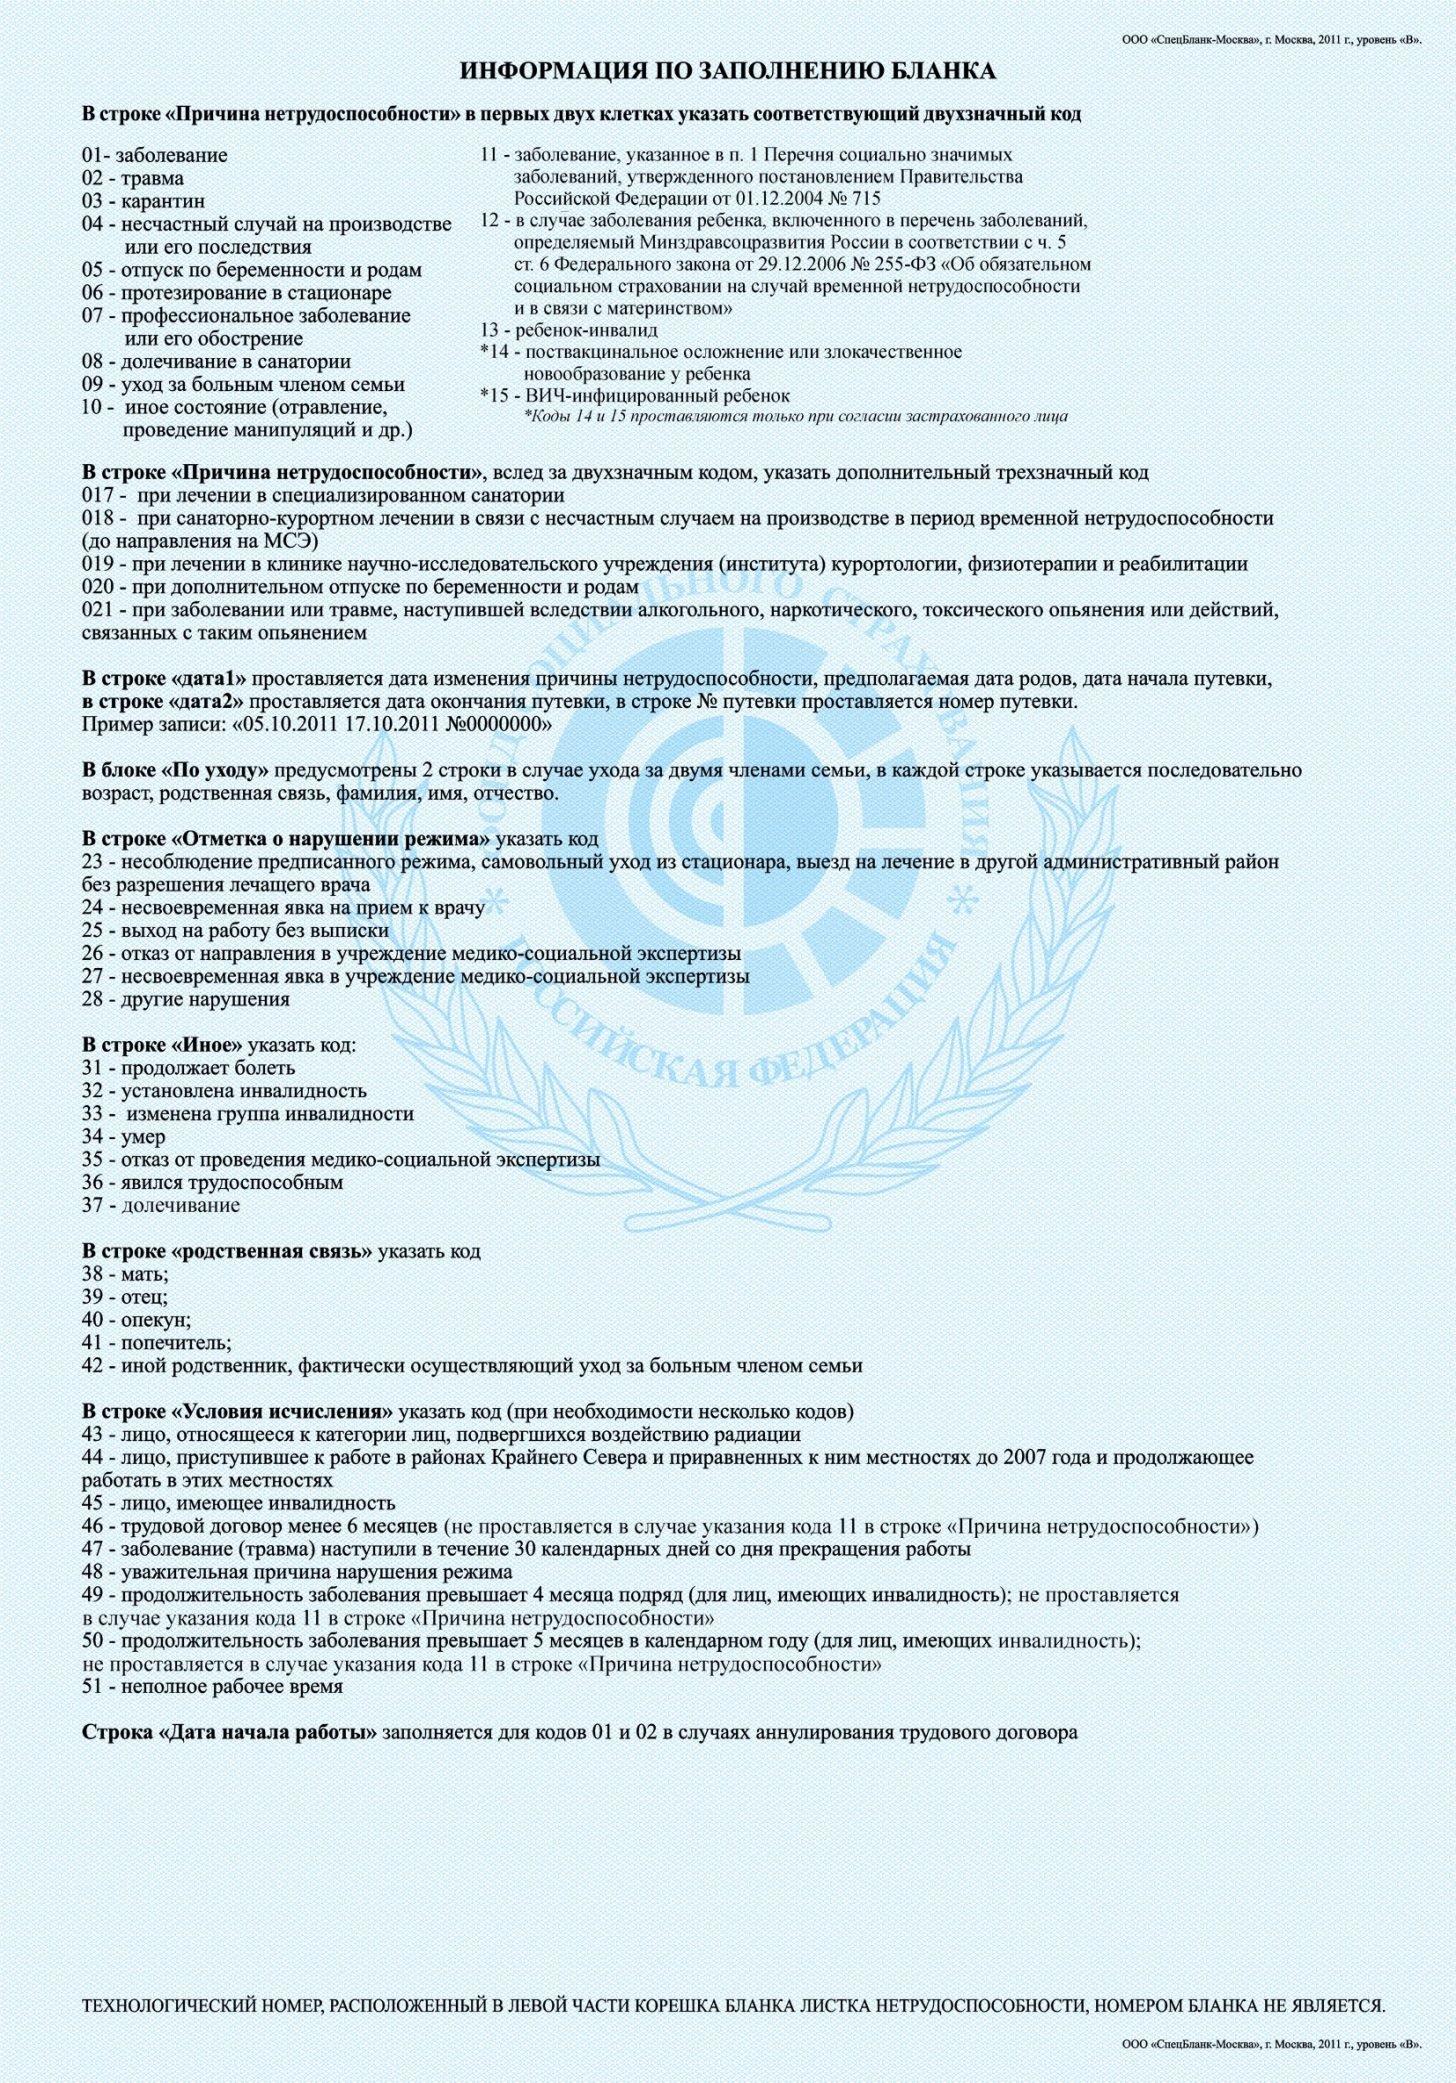 Ст 24 конституции рф